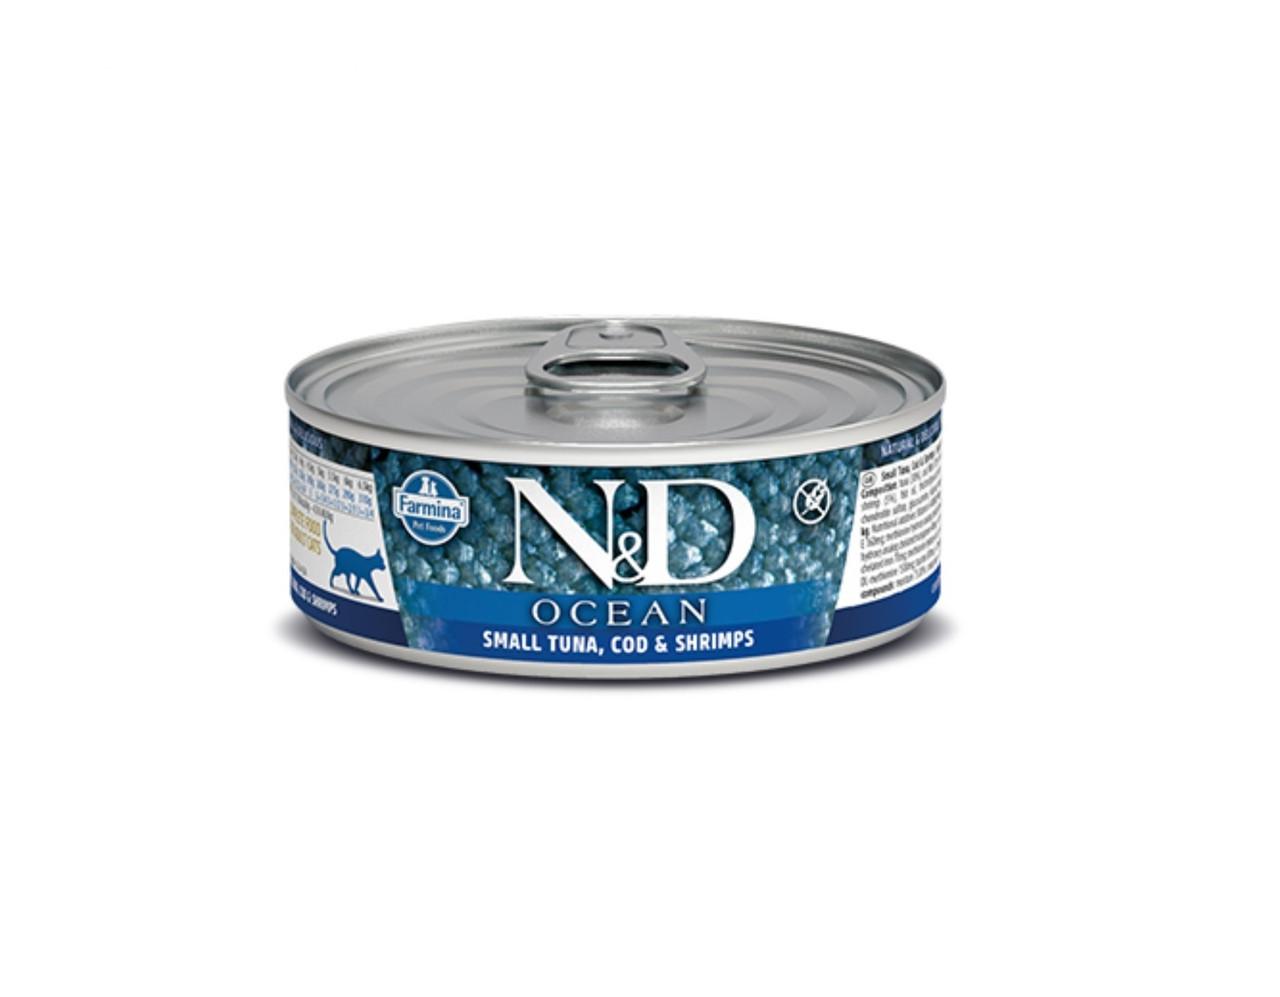 N&D Ocean Adult, тунец, треска, креветки, банка 80гр.